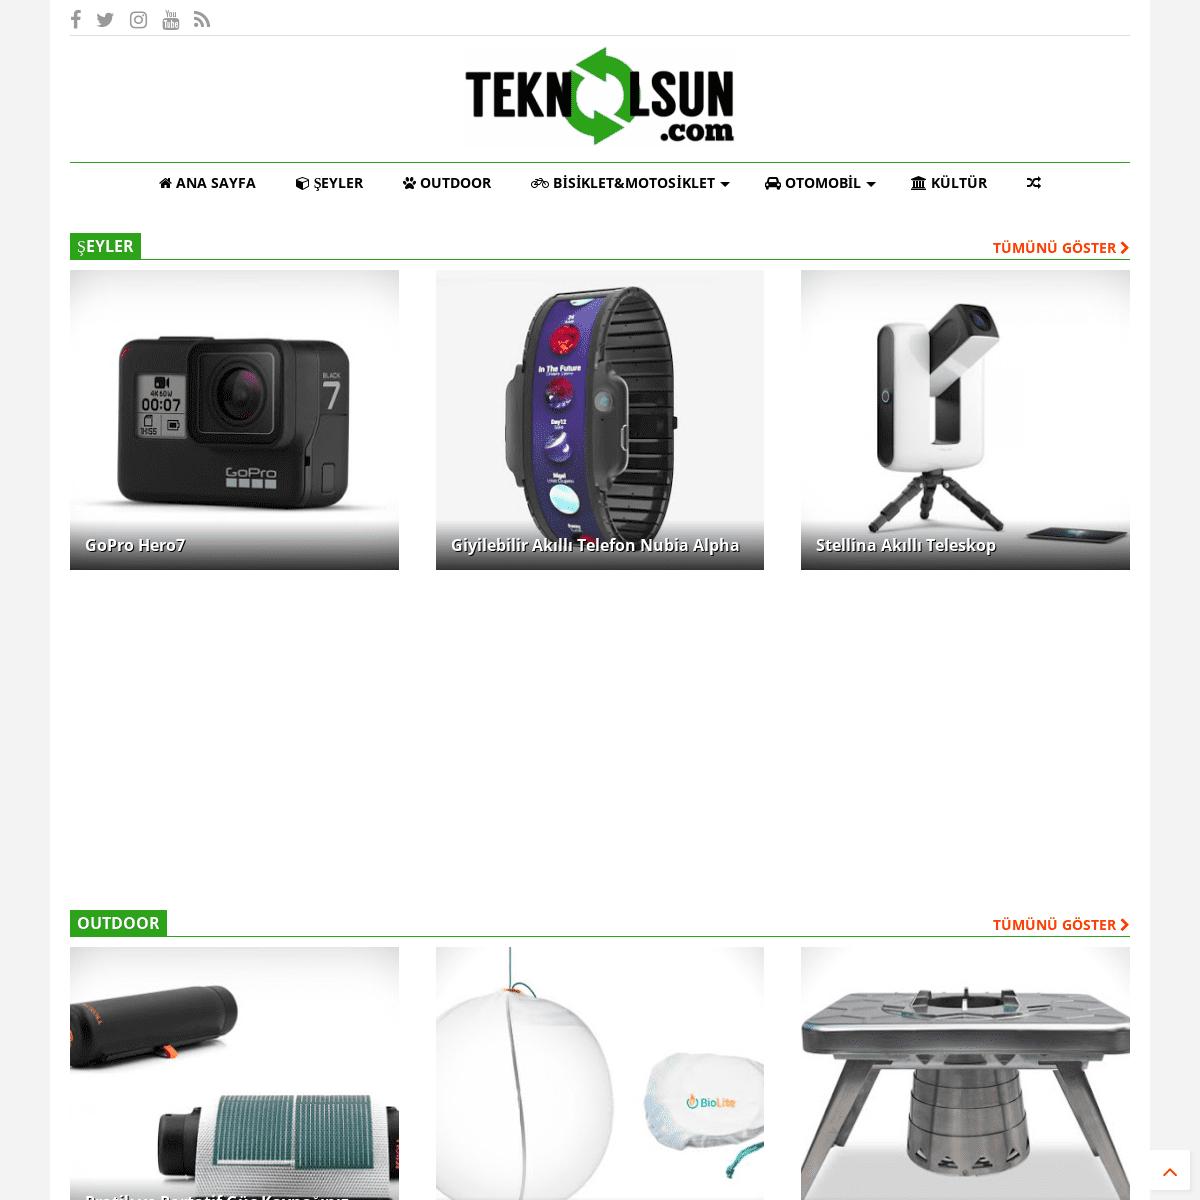 wholesale price save up to 80% run shoes ArchiveBay.com - Citation for: teknolsun.com - TeknOlsun